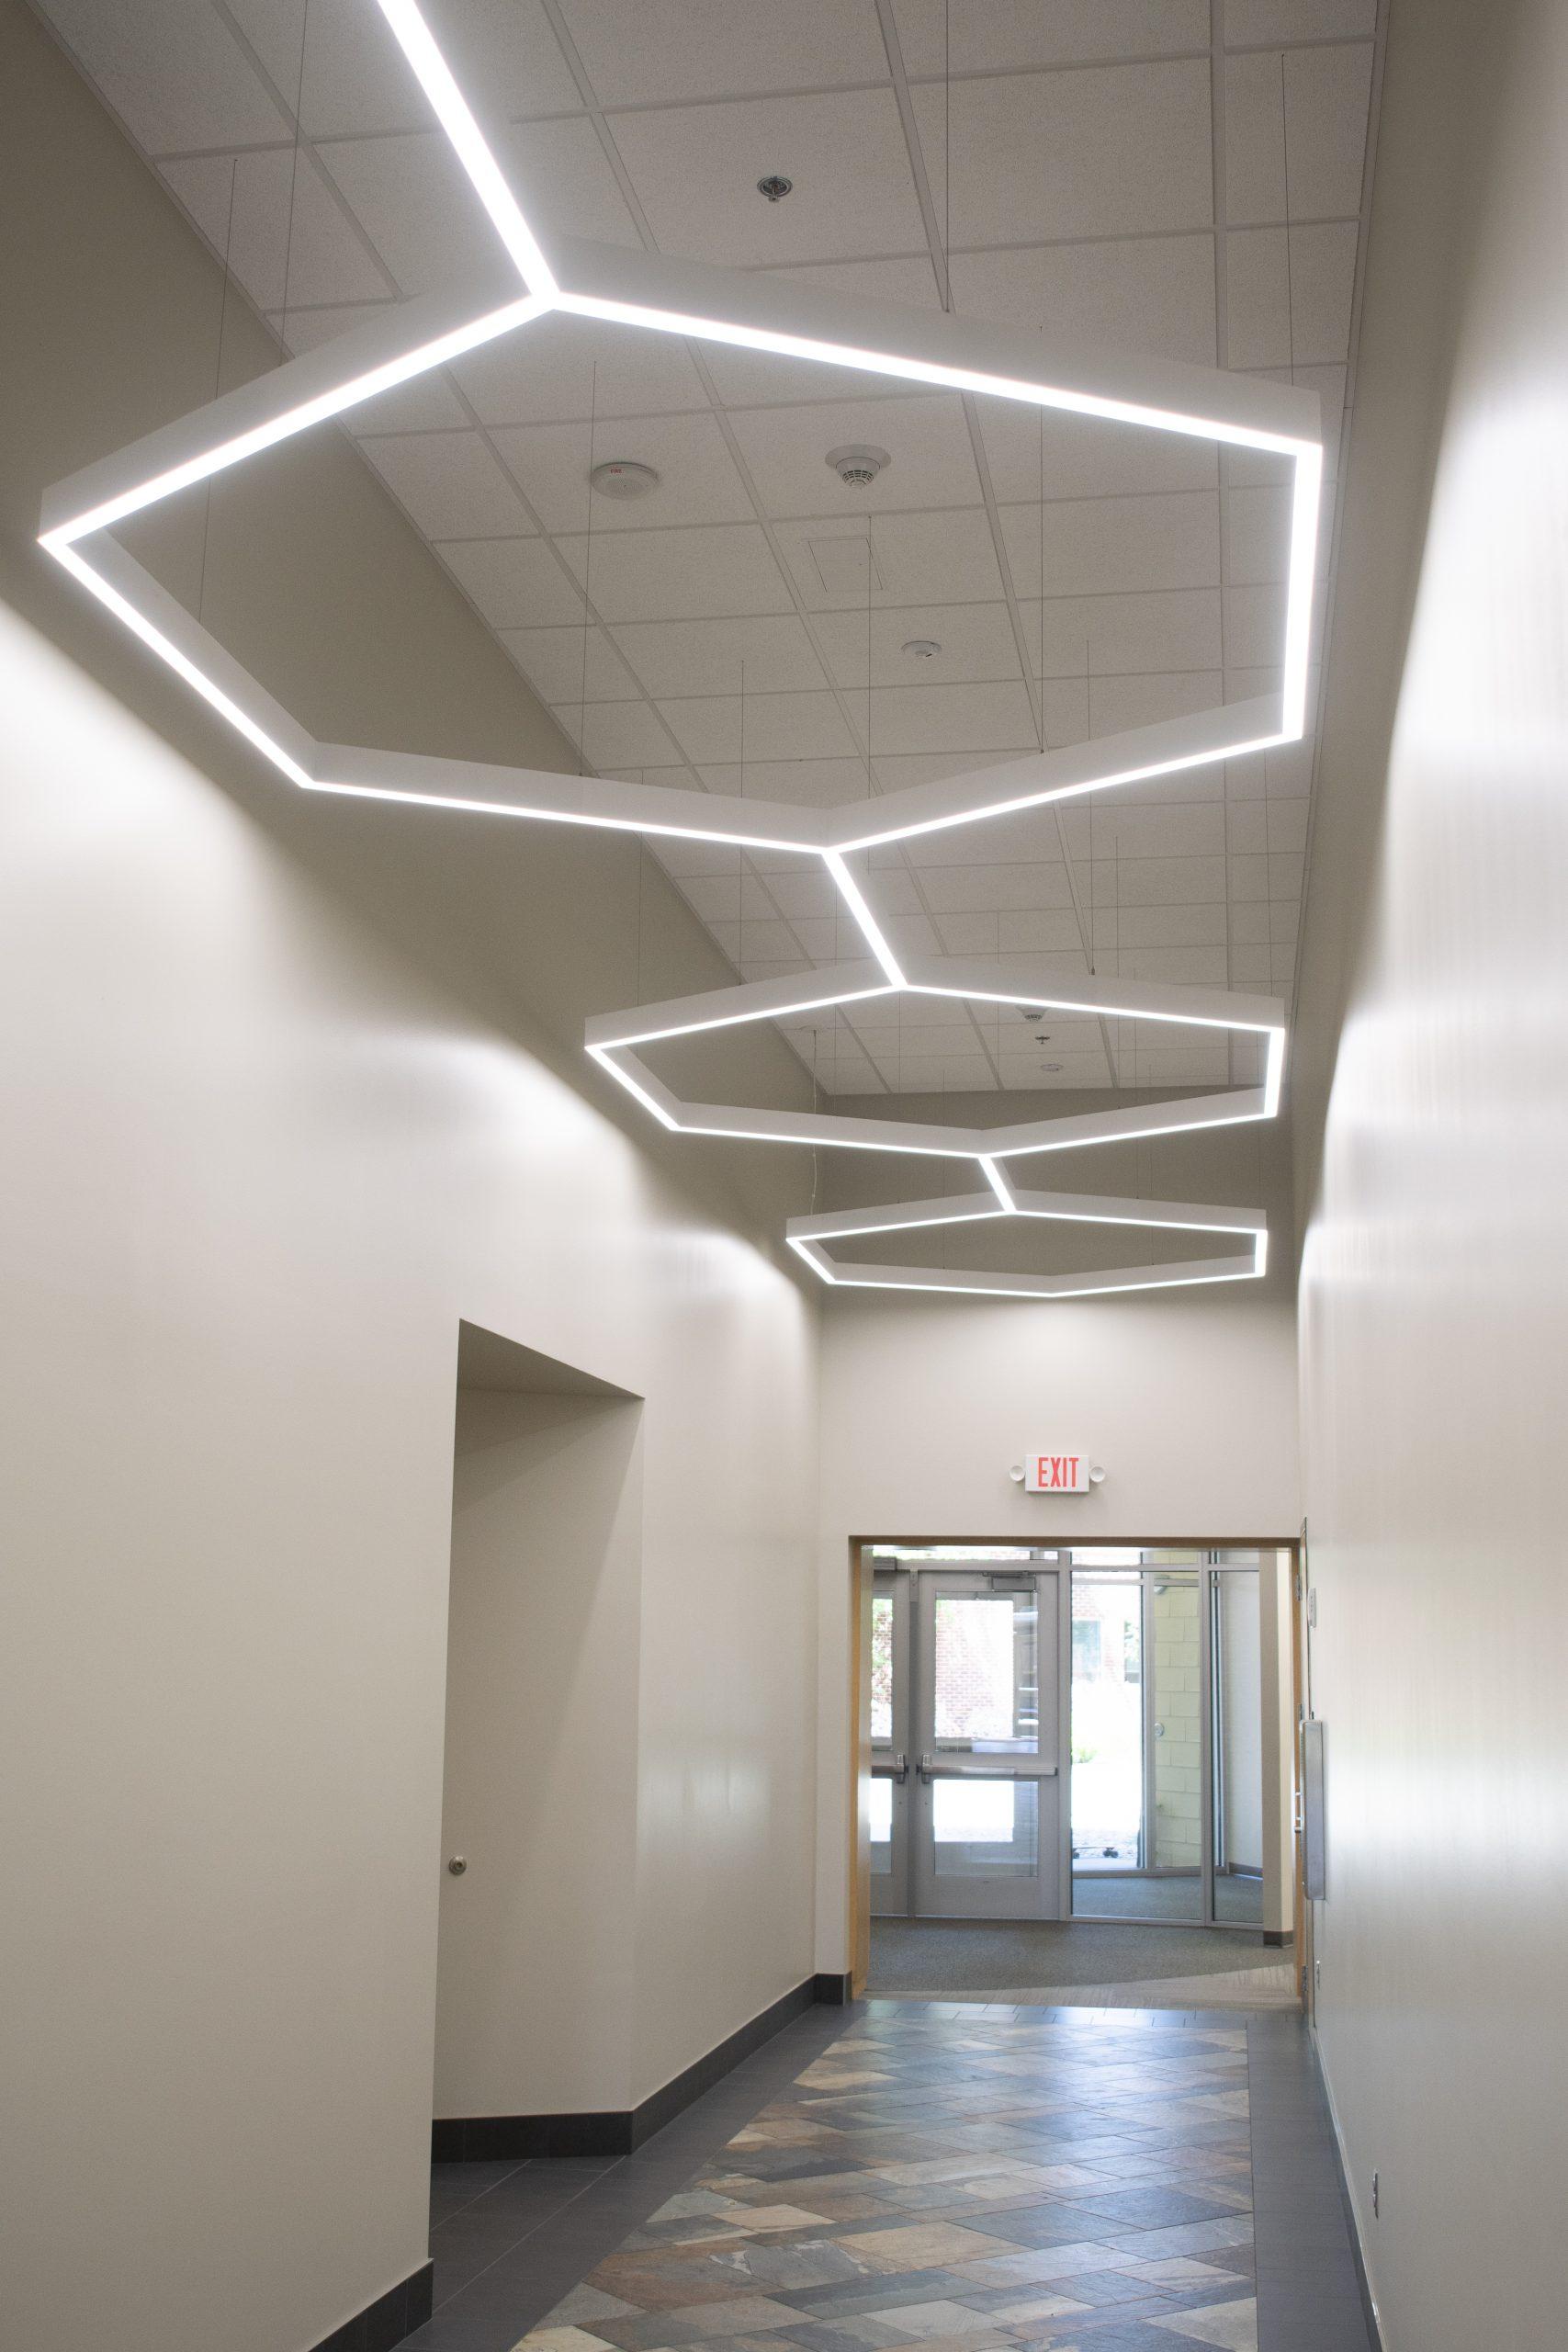 Dordt University Nursing Renovation & Addition and Big Box Theater   Electrical Engineering Design Services   Engineering Design Associates